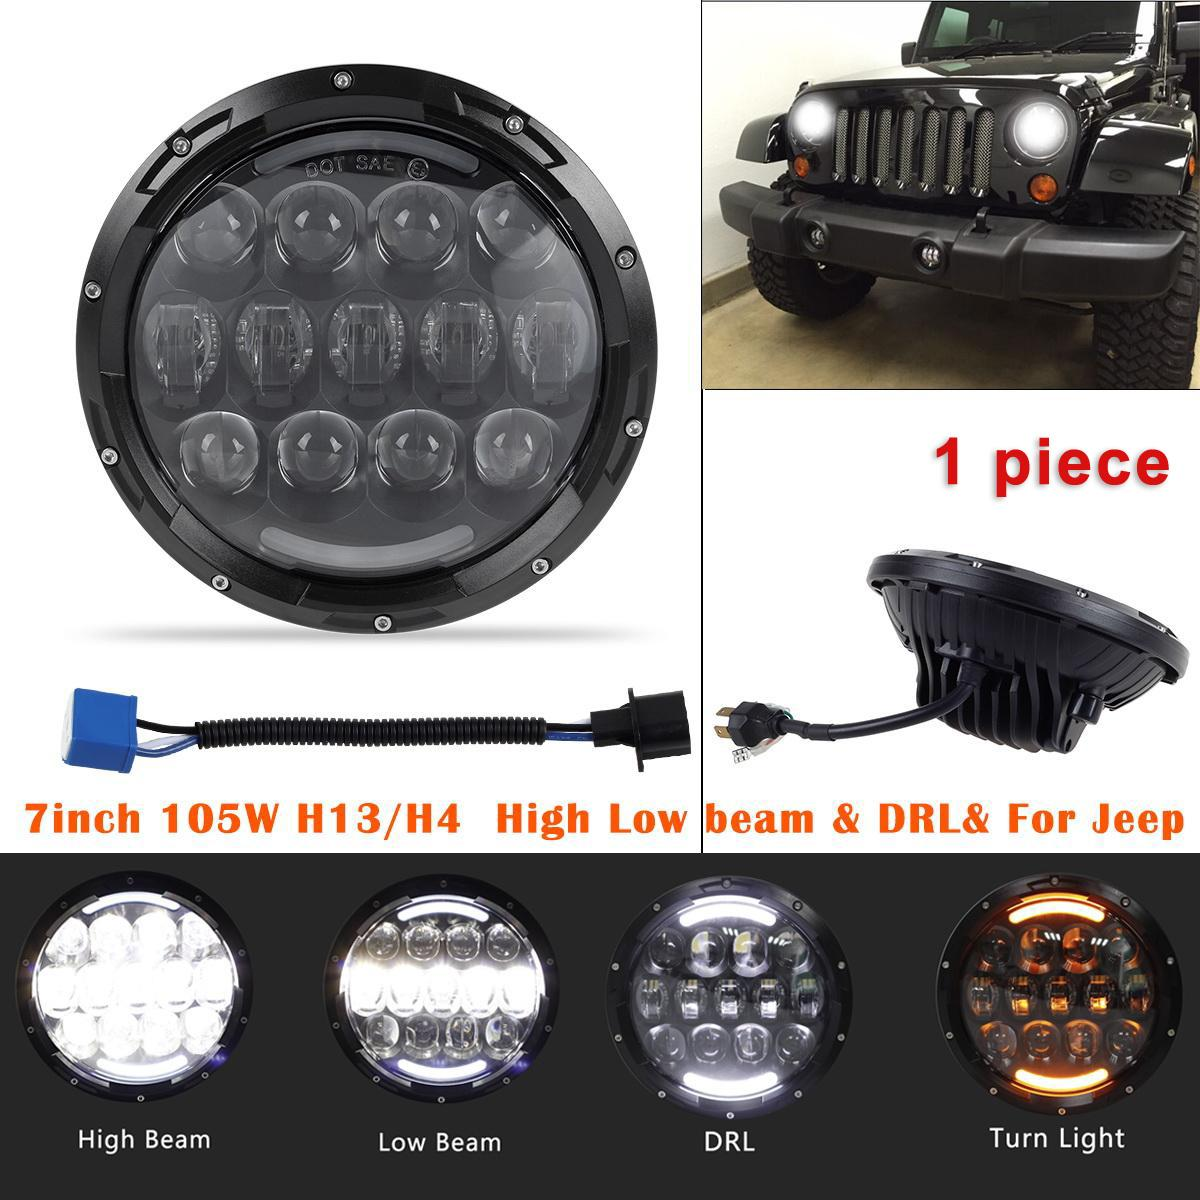 7 Quot 105w Led Cree Headlight Hi Lo Beam For 97 16 Jeep